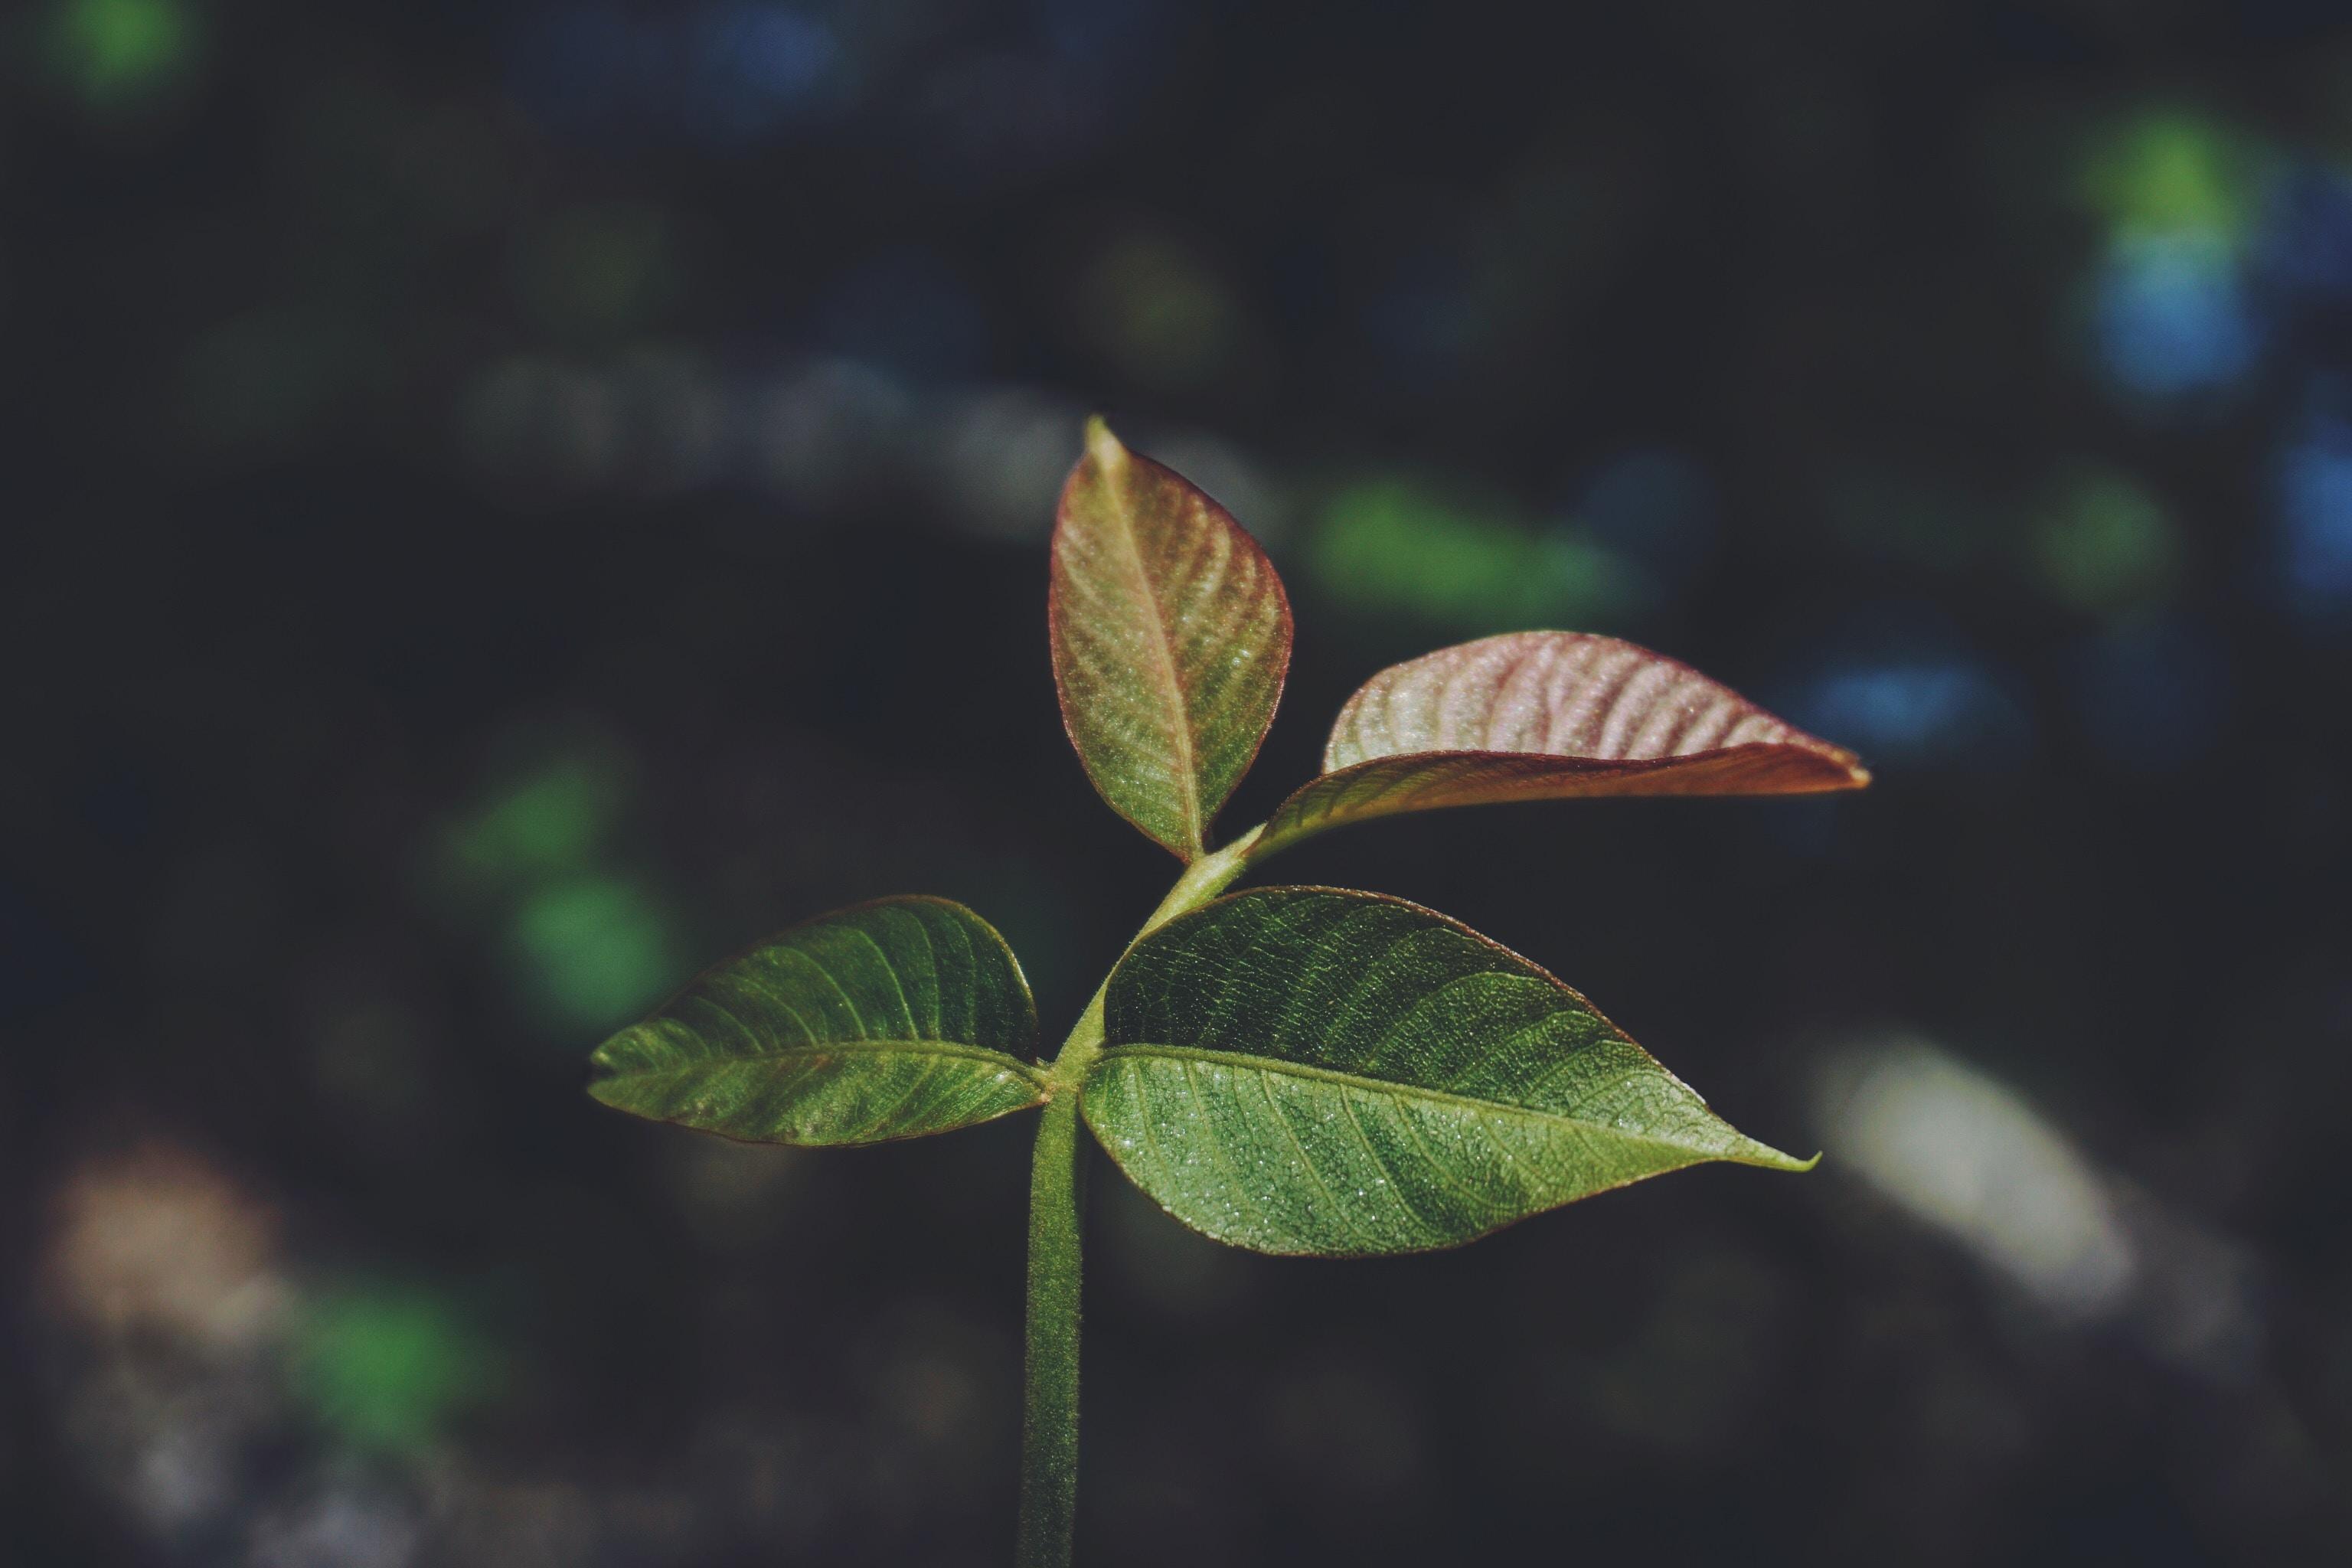 macro shot of green and maroon plant